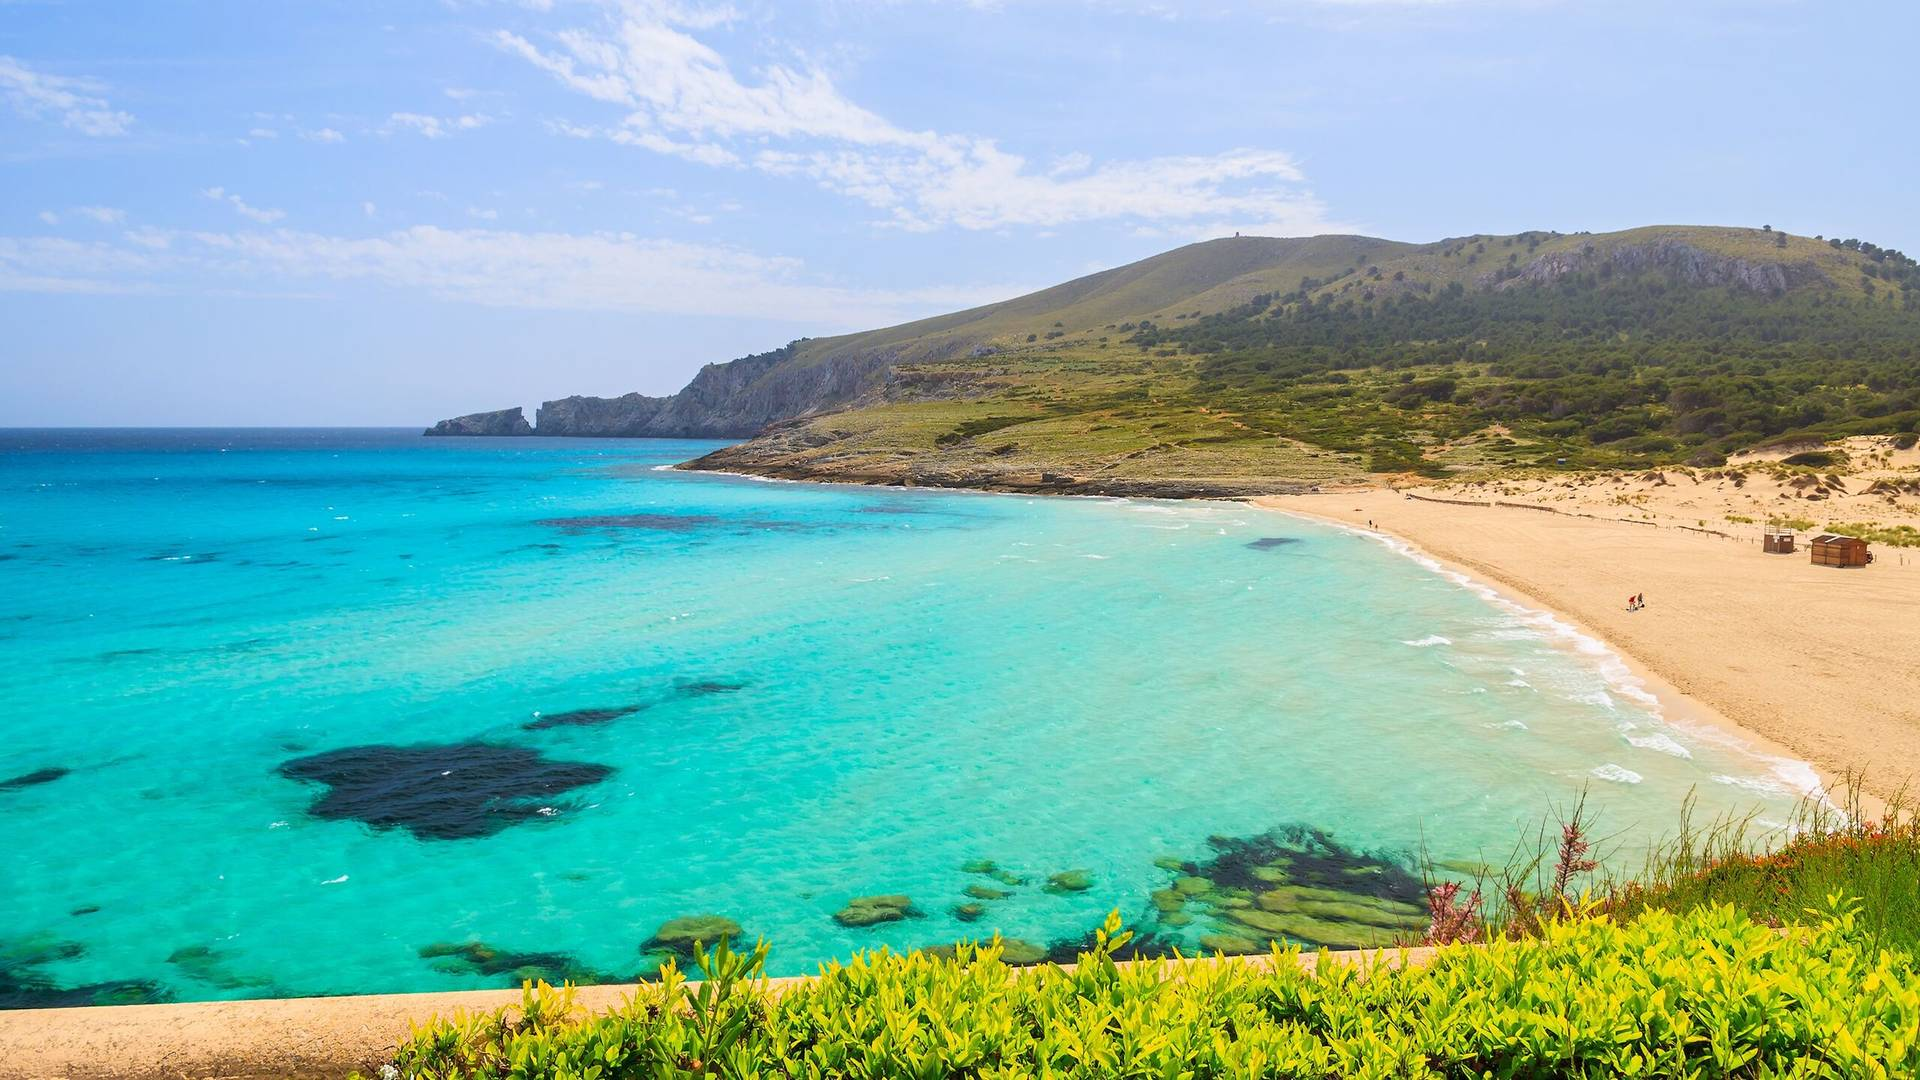 A beach on a smaller Balearic Islands